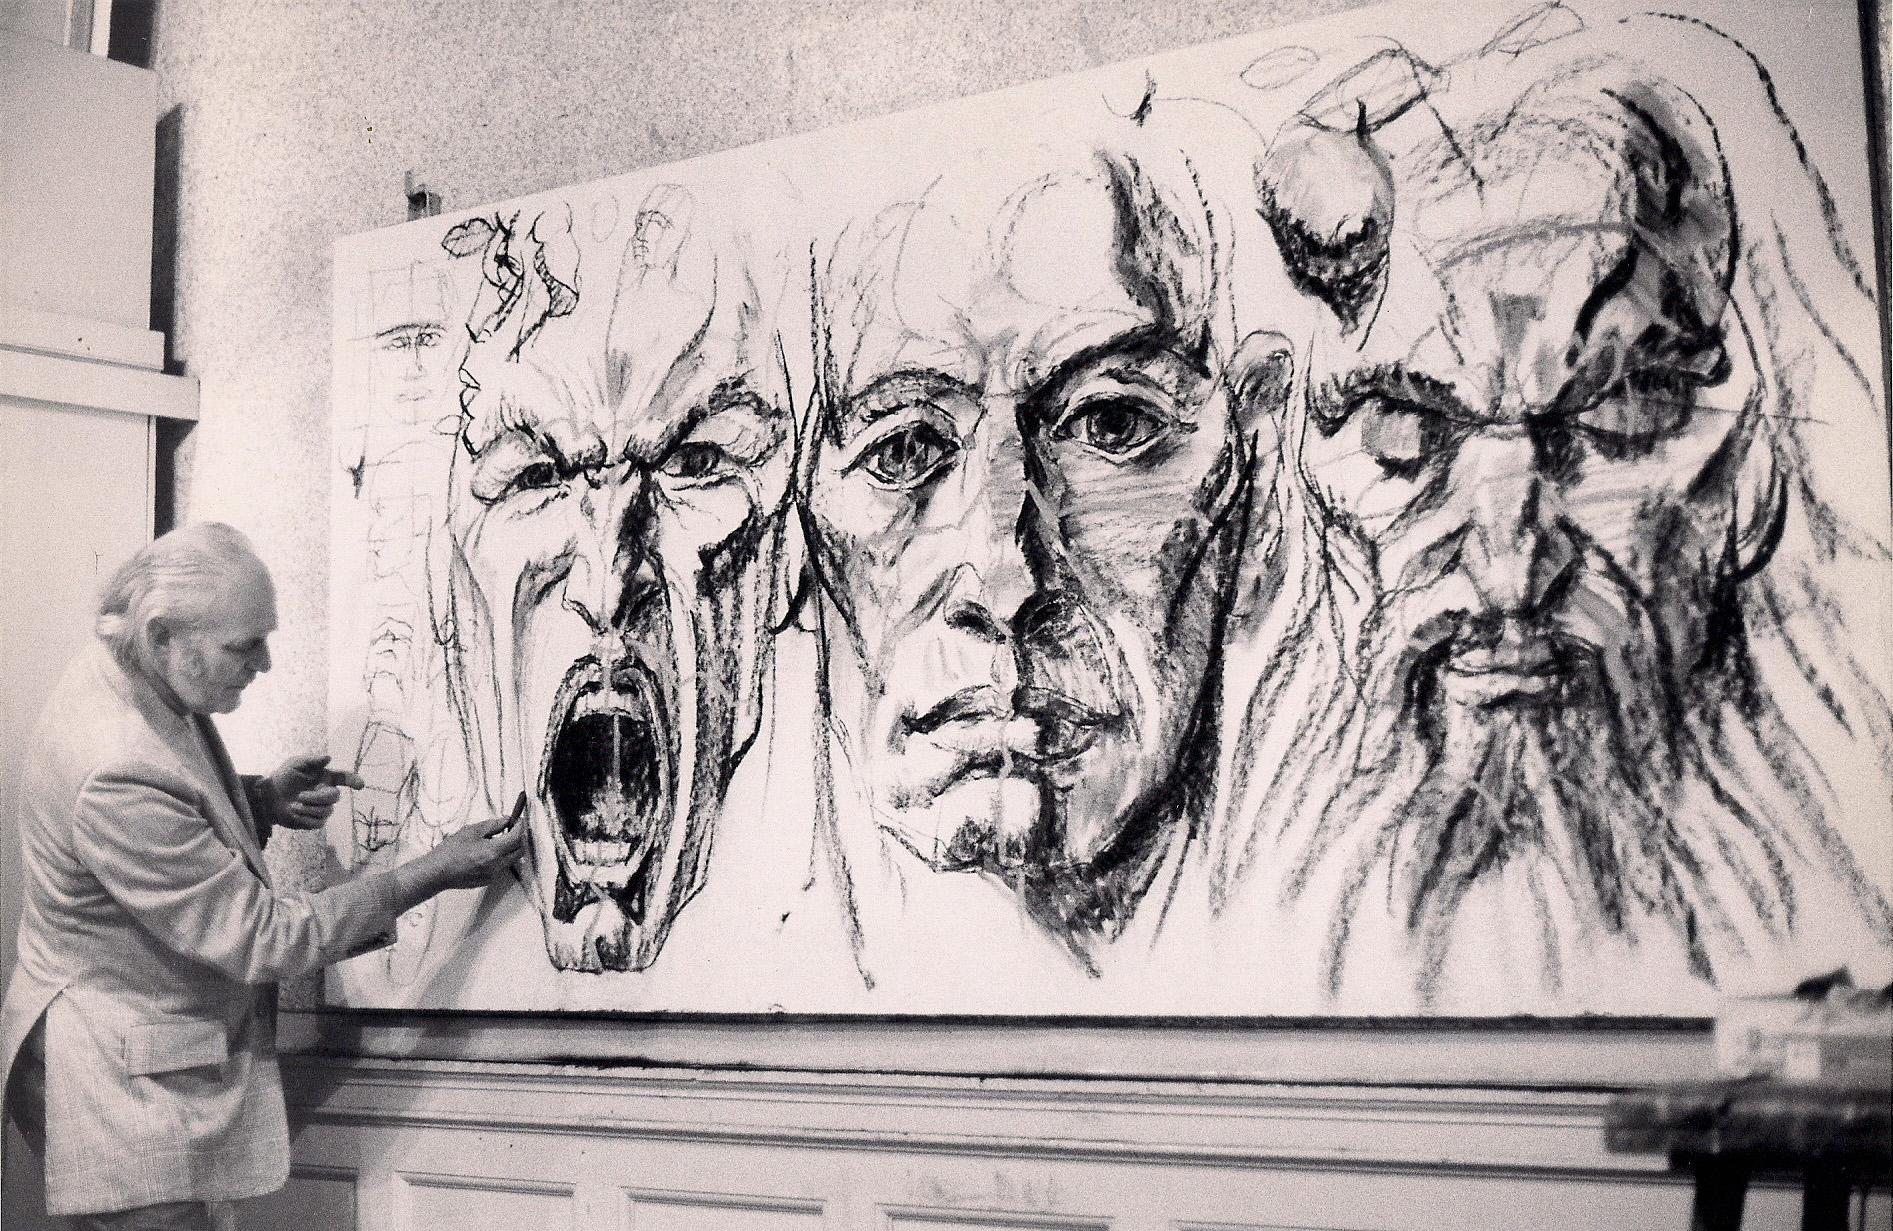 (Chalk, 4 x 8 ft.) 1985